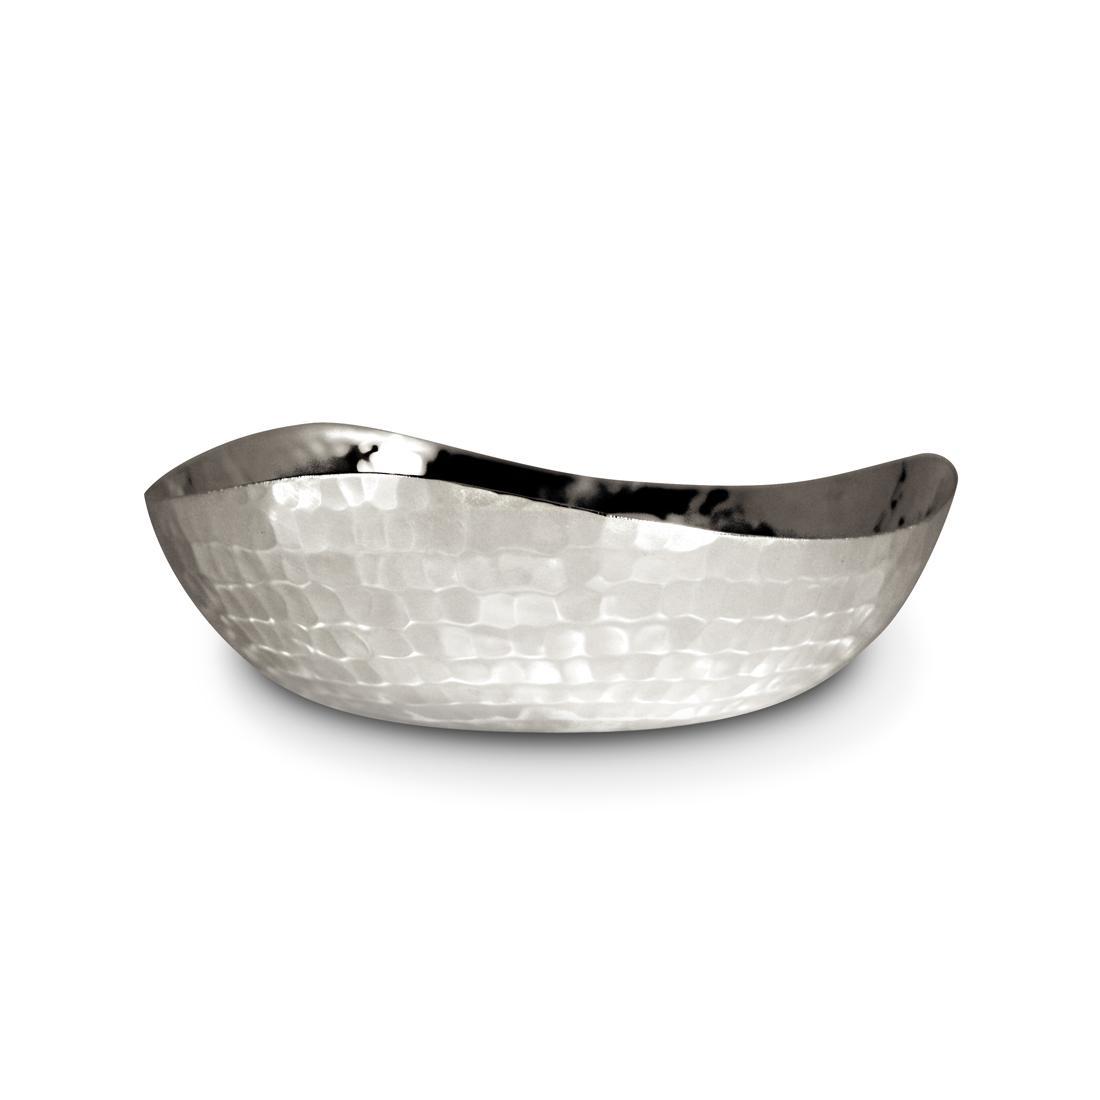 6-Inch Triangular Hammered Bowl